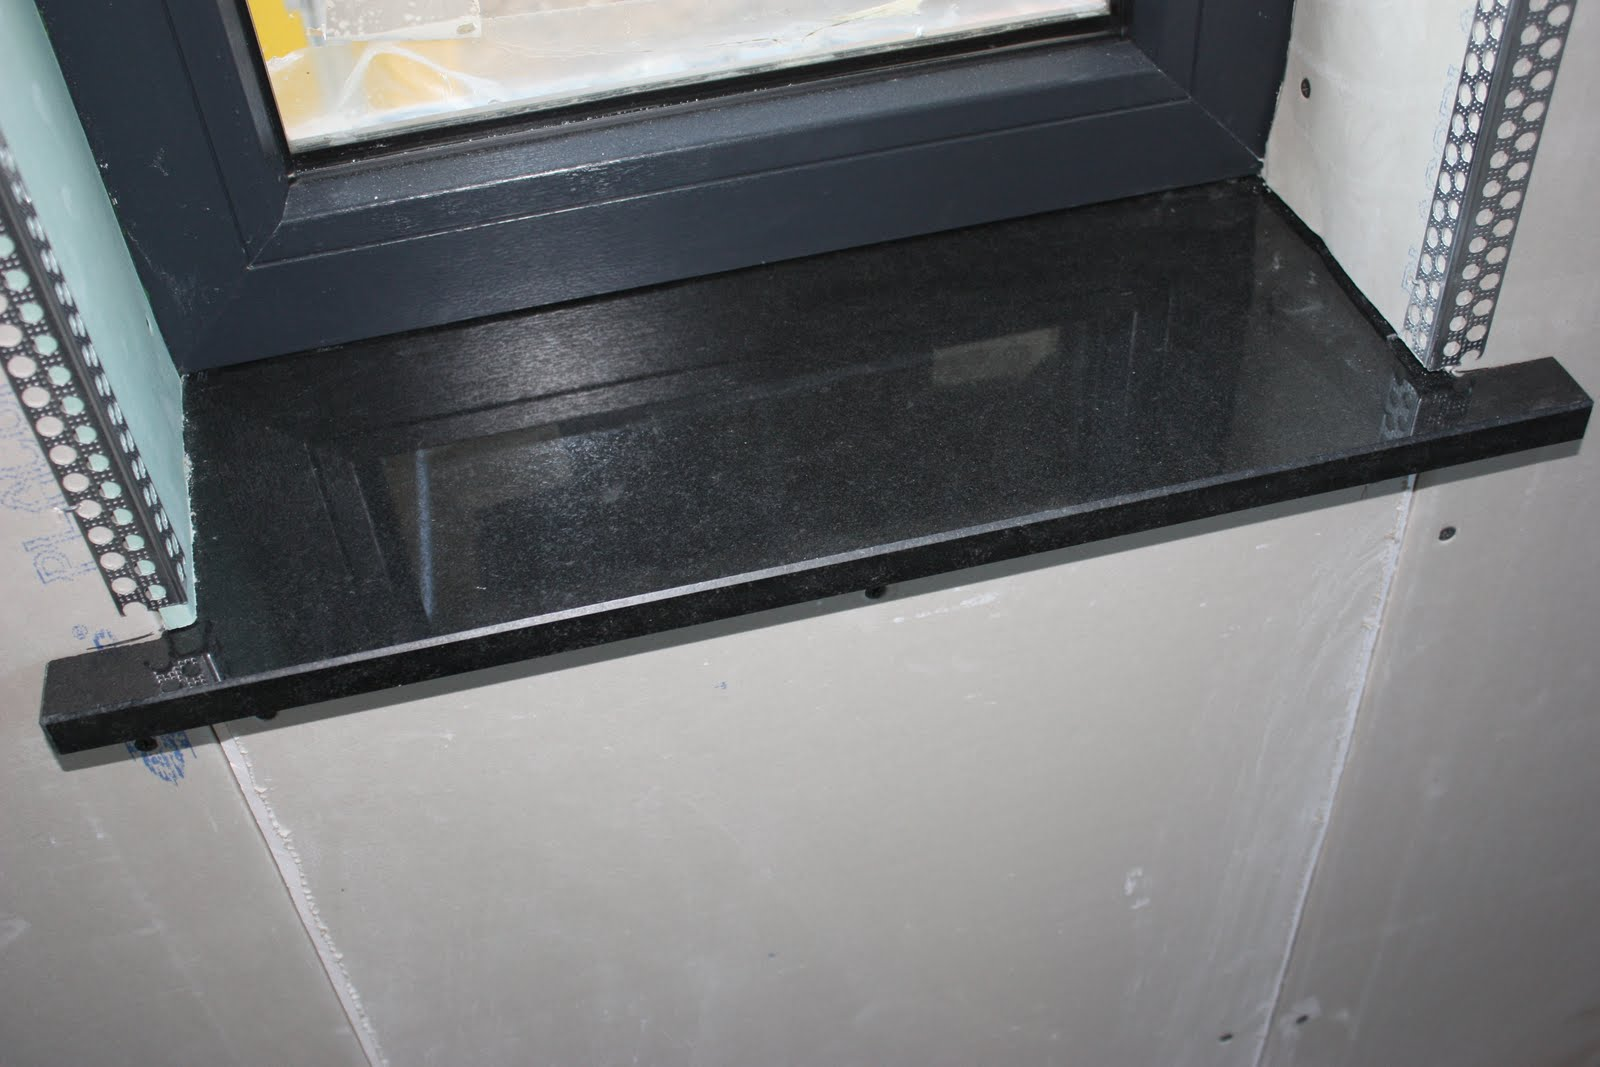 mob ossature bois isolation energie domotique bbc knx alsace placo derniers. Black Bedroom Furniture Sets. Home Design Ideas